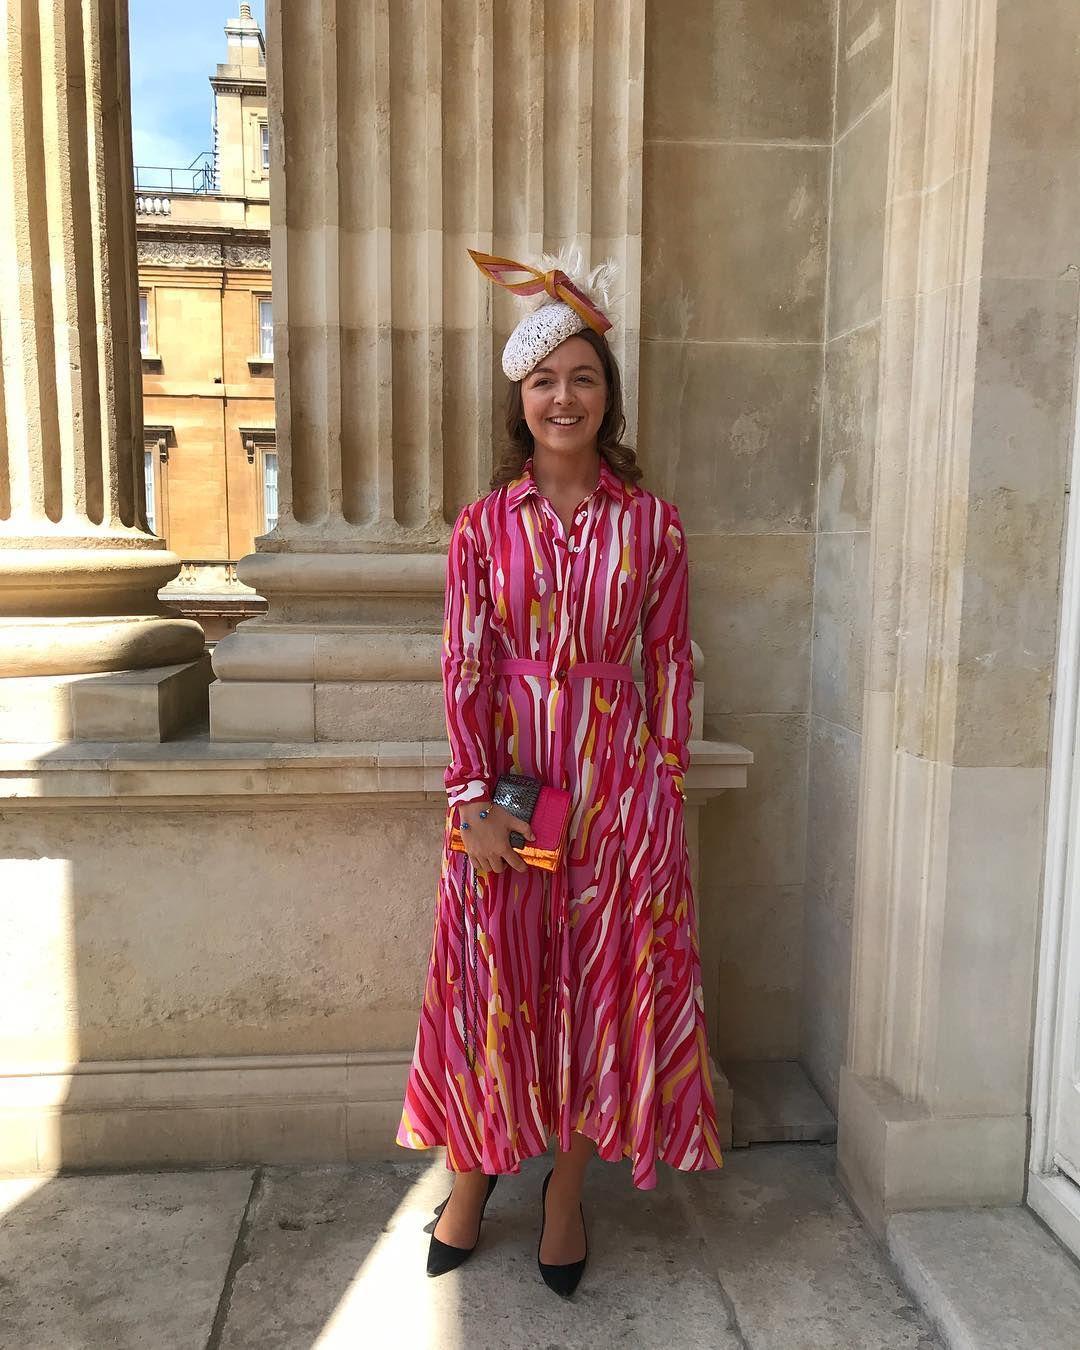 Znalezione obrazy dla zapytania Flora Ogilvy trooping the colour 2018 pinterest